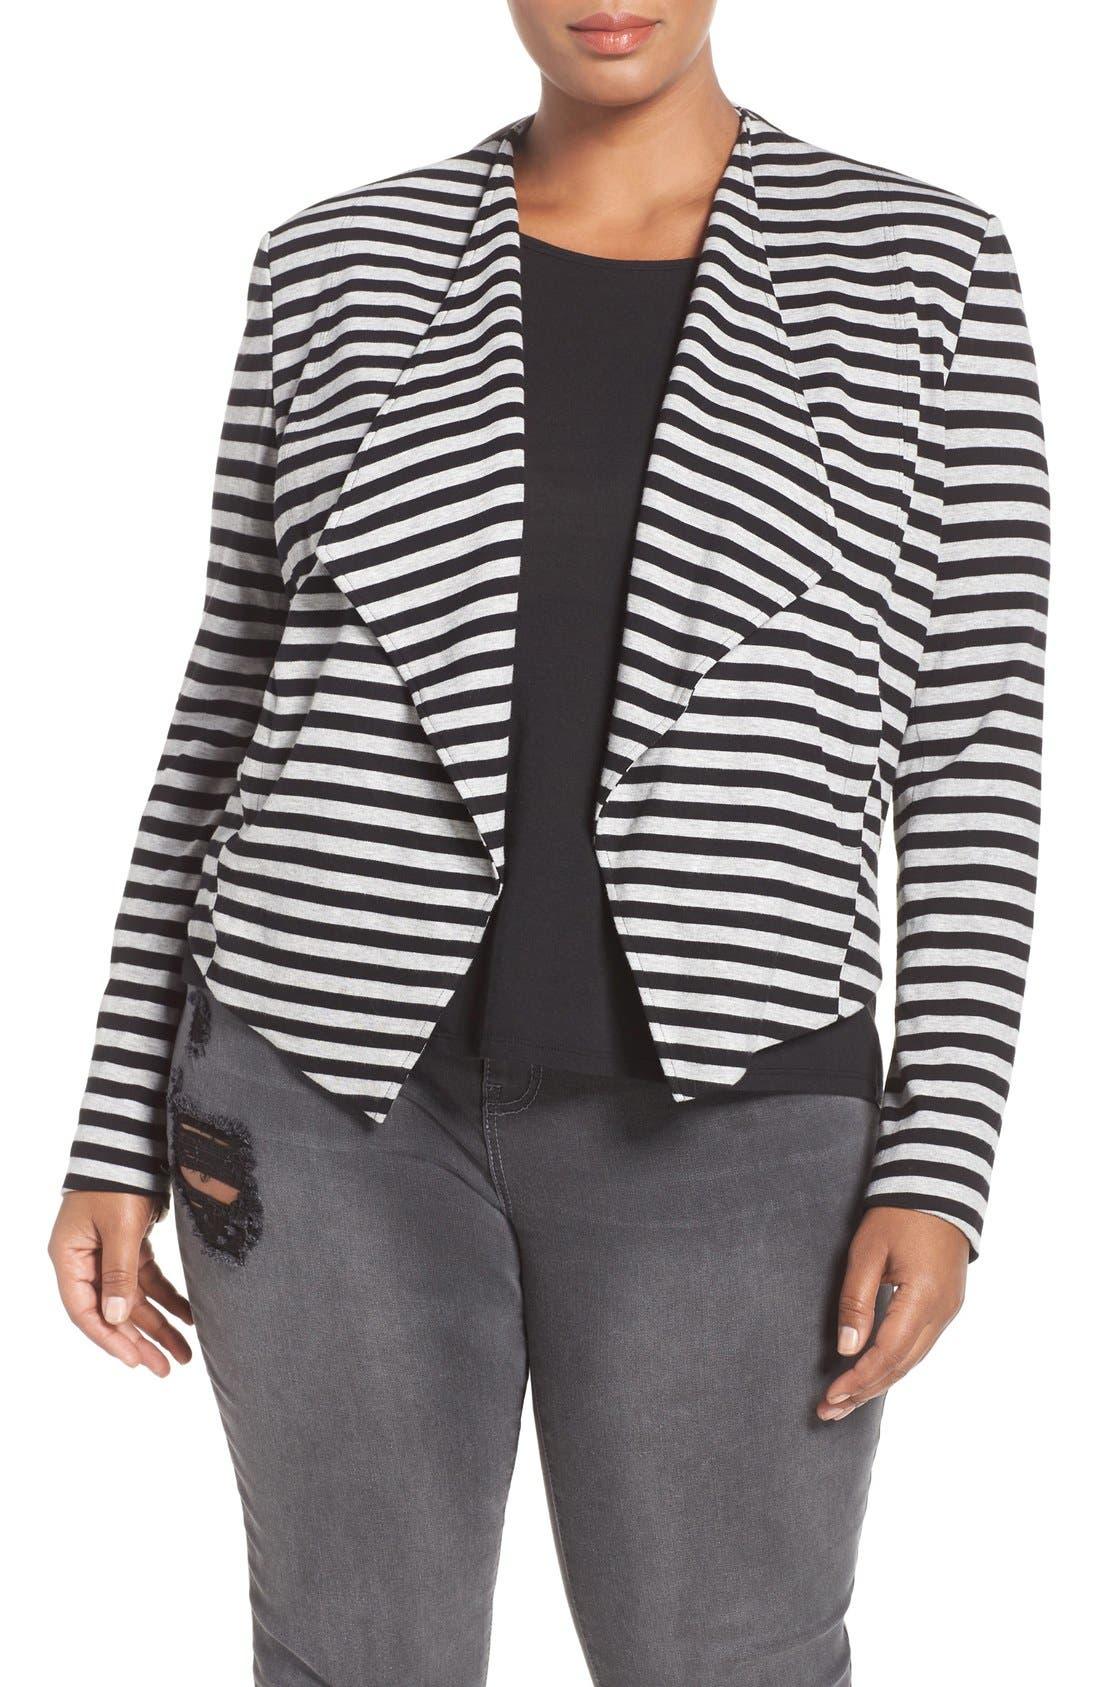 Main Image - Tart 'Veronicka' Stripe Knit Open Front Jacket (Plus Size)